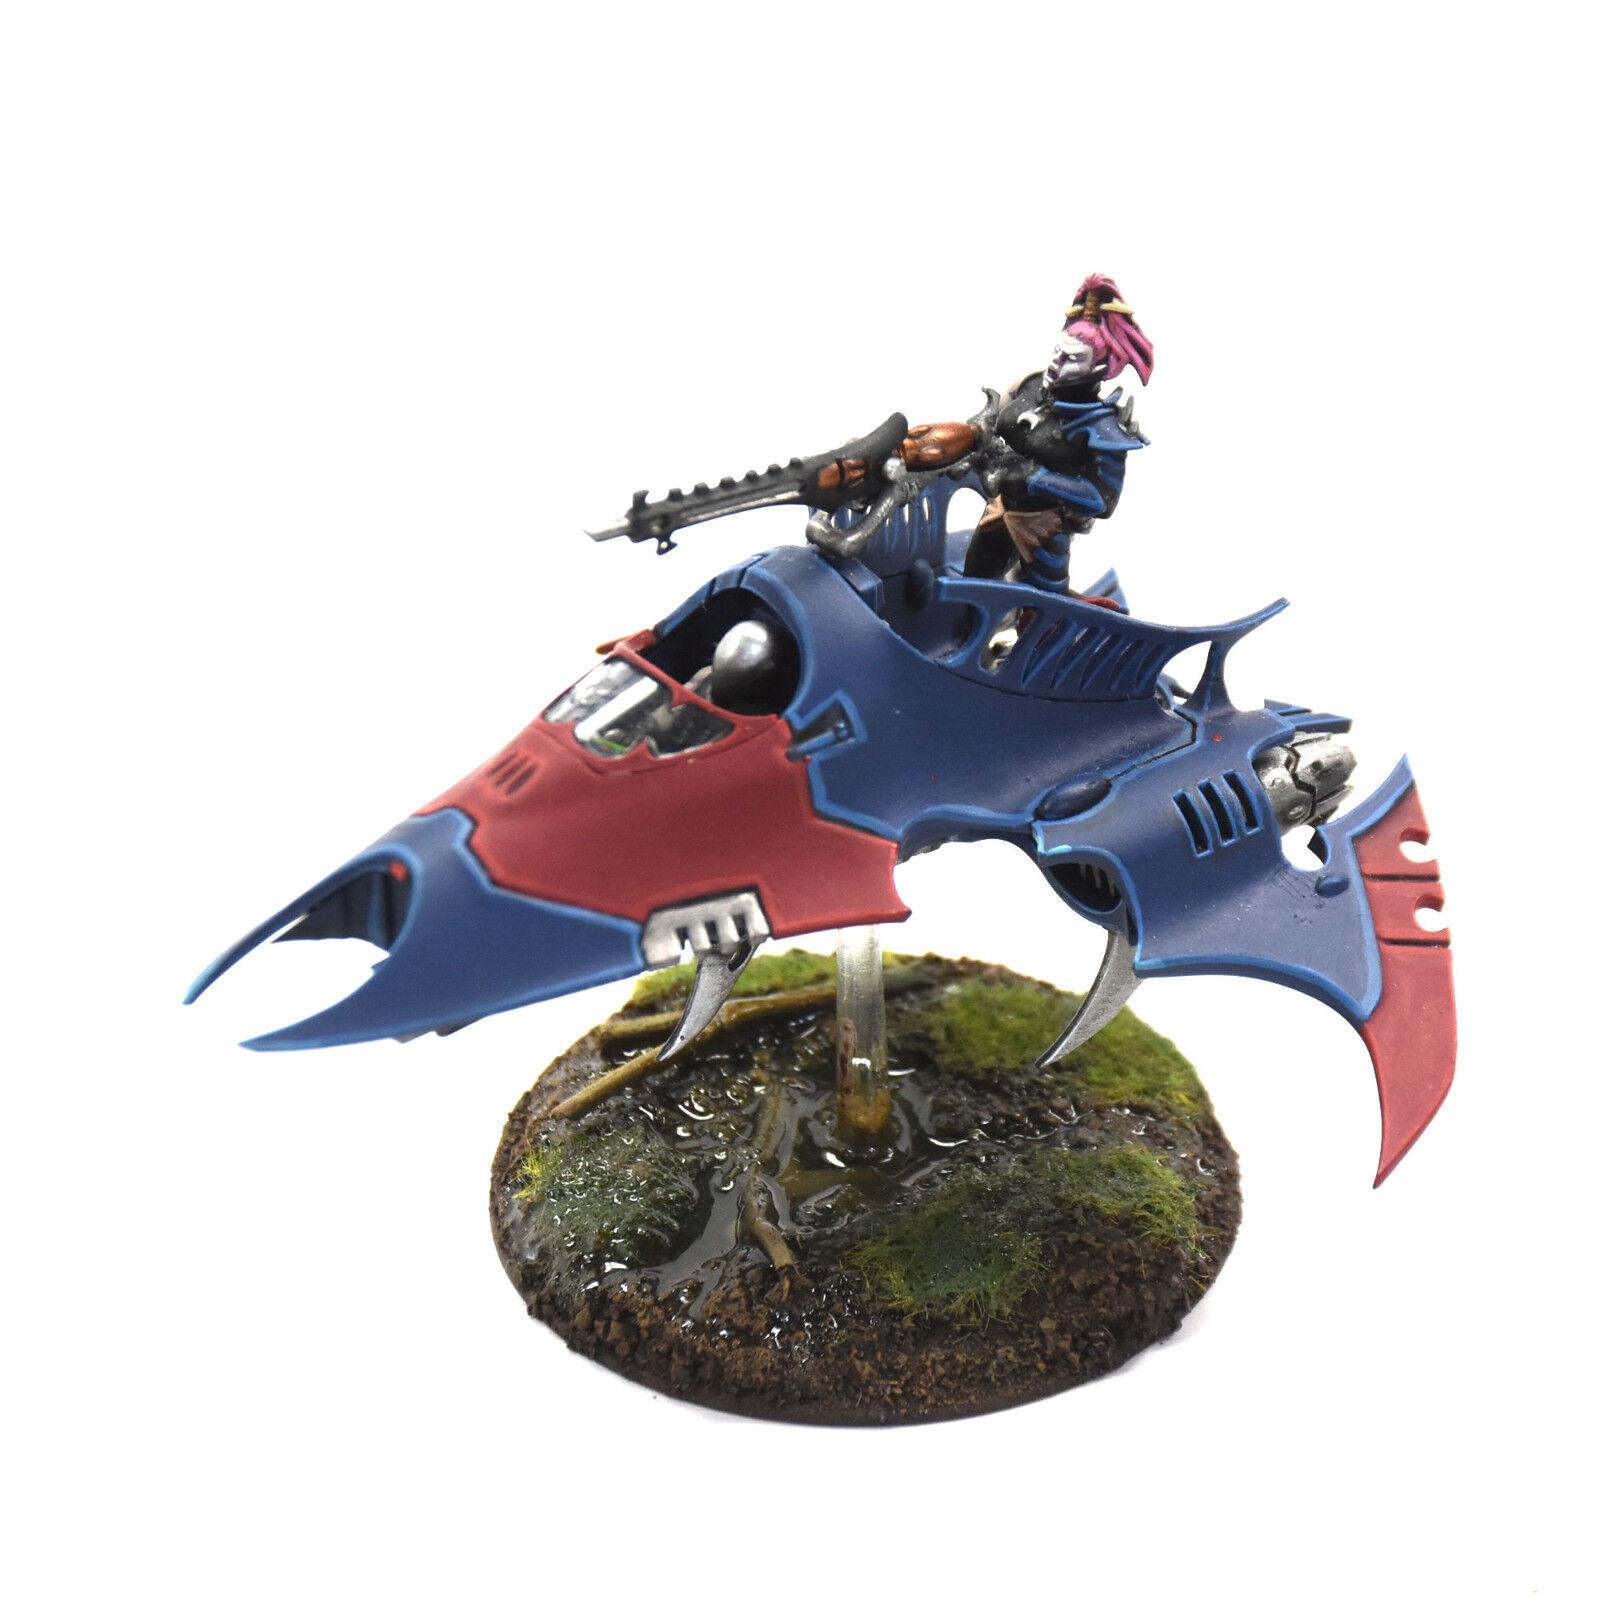 DARR ELDAR Venom PRO PAINTED Warhammer 40K Drukhari